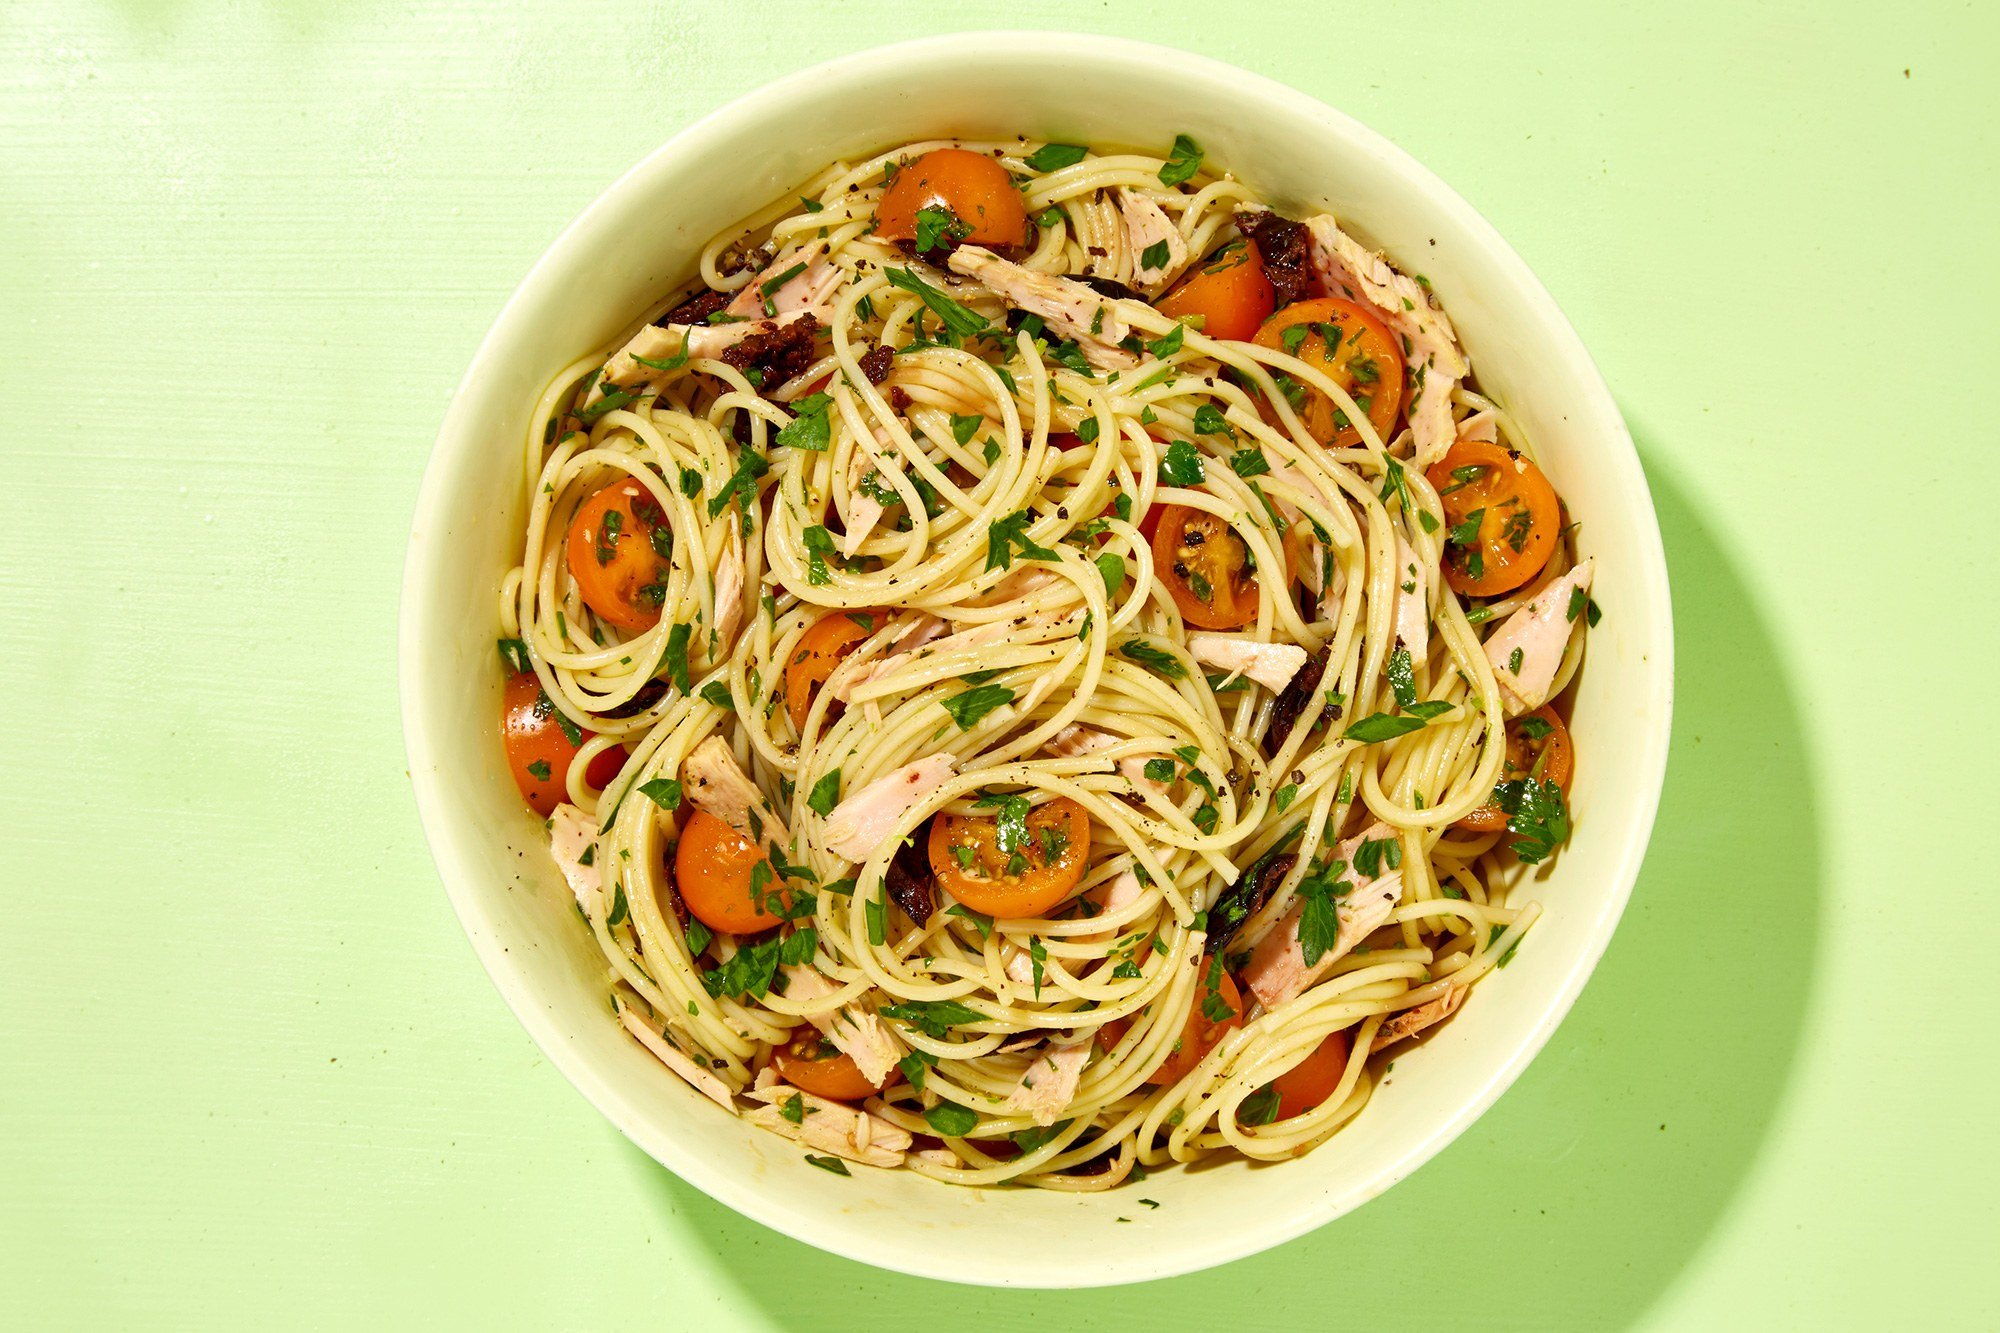 Nudeln mit Thunfisch Spaghetti lecker